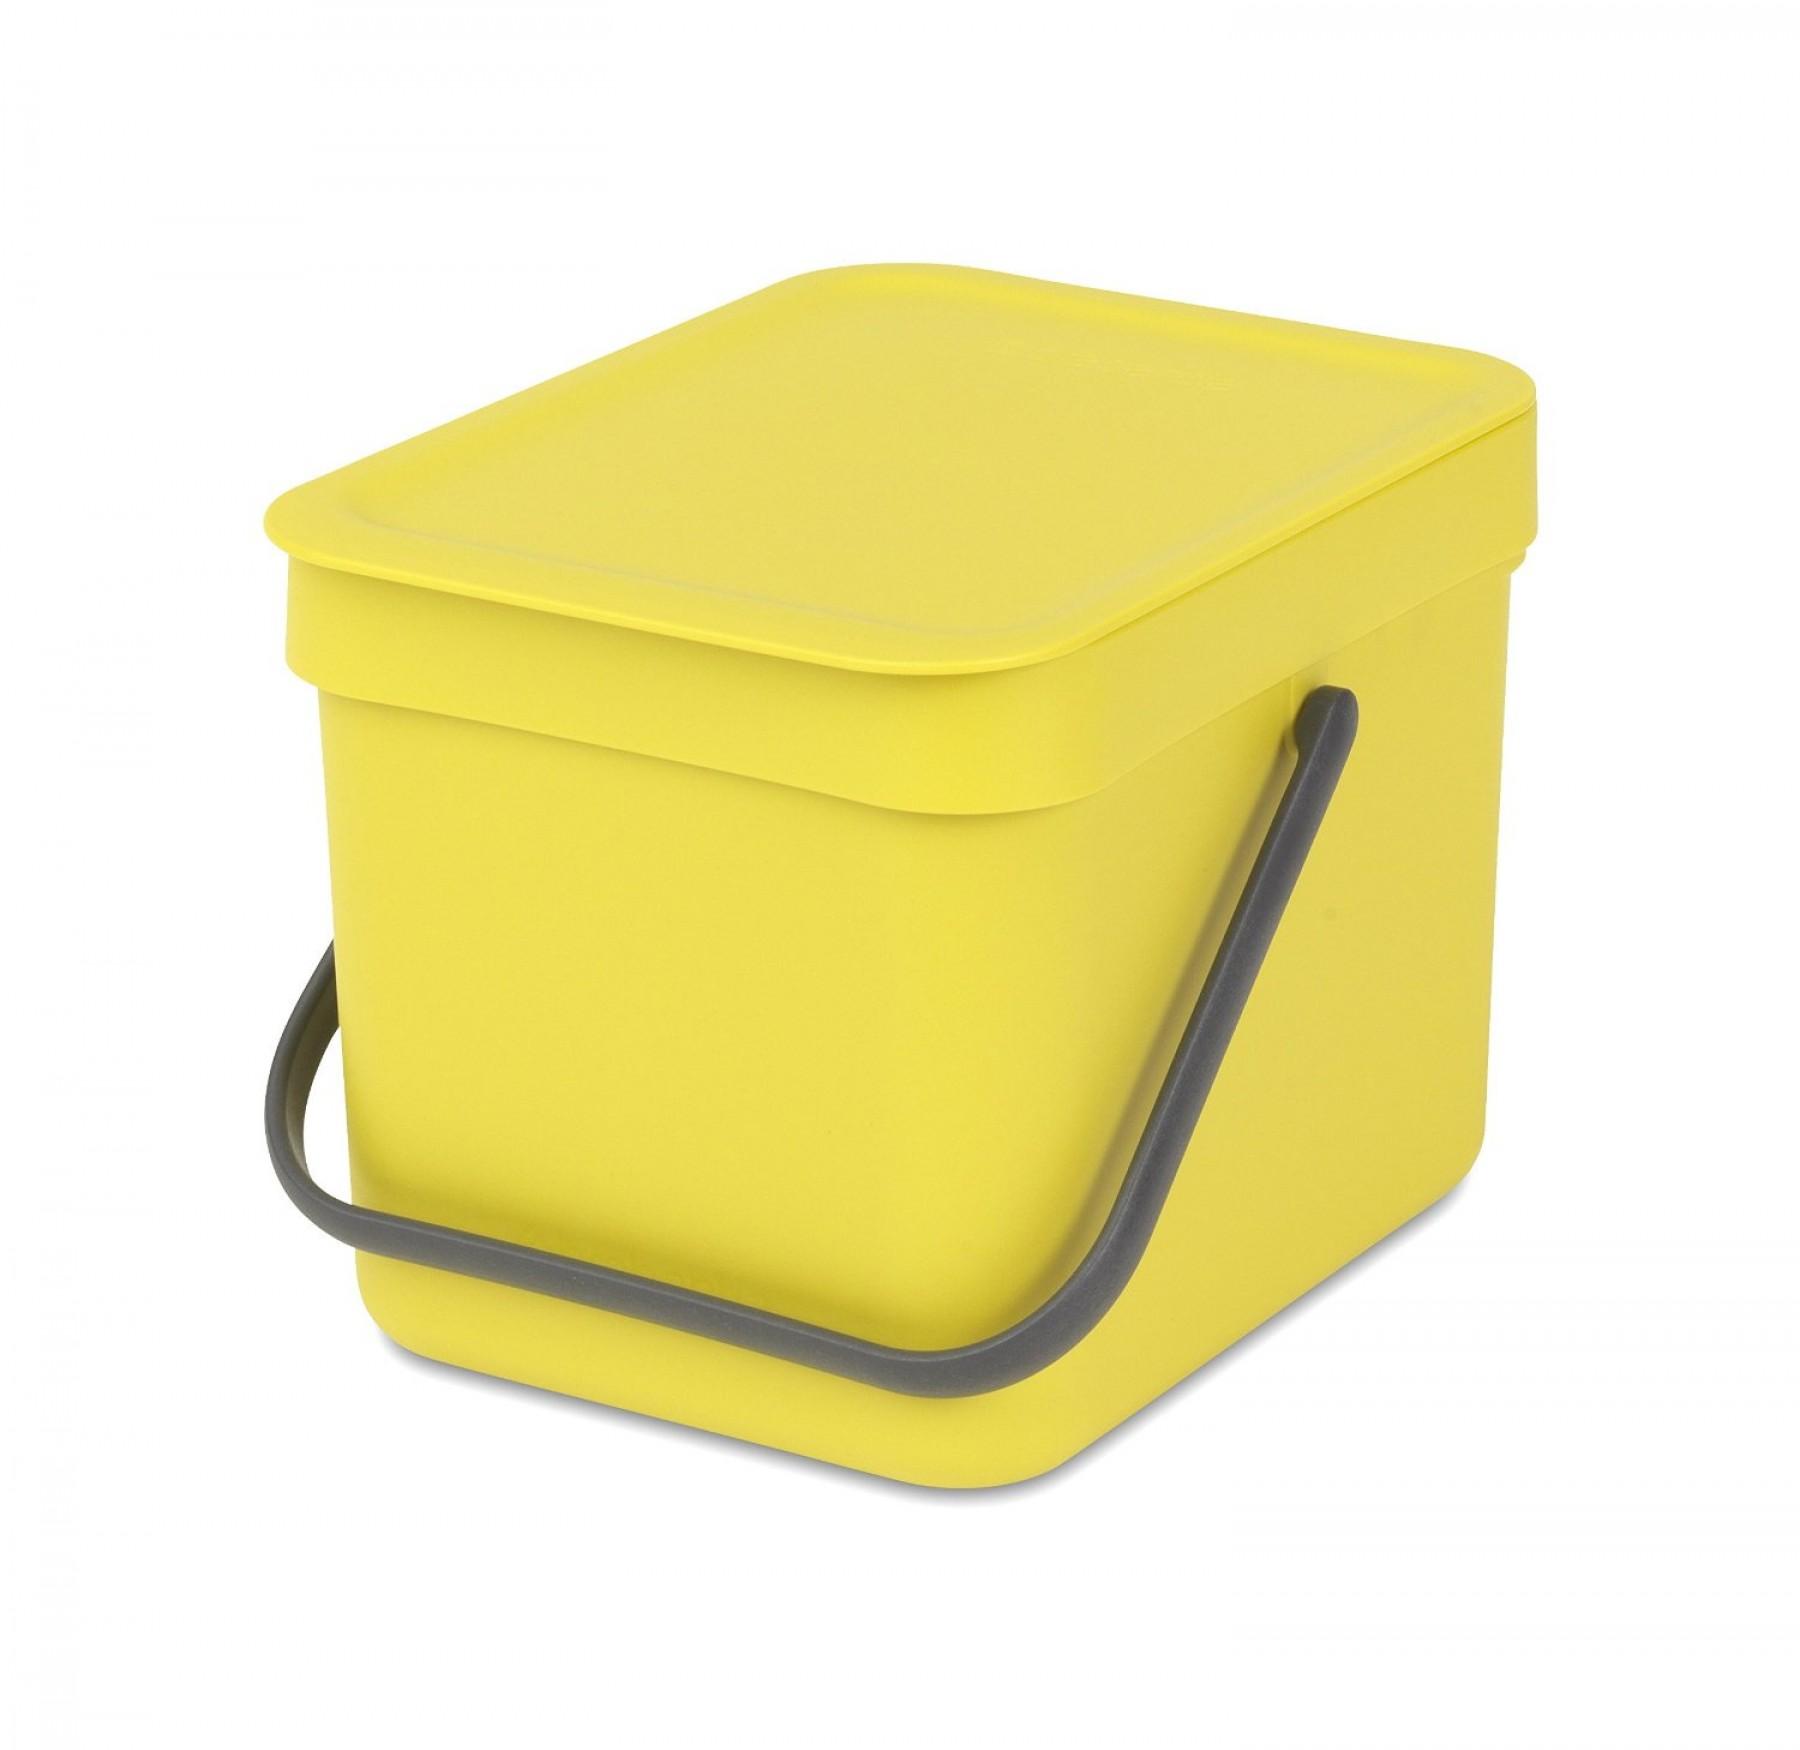 BRABANTIA atkritumu tvertne Sort & Go, 6 l, yellow 109683 atkritumu tvertne